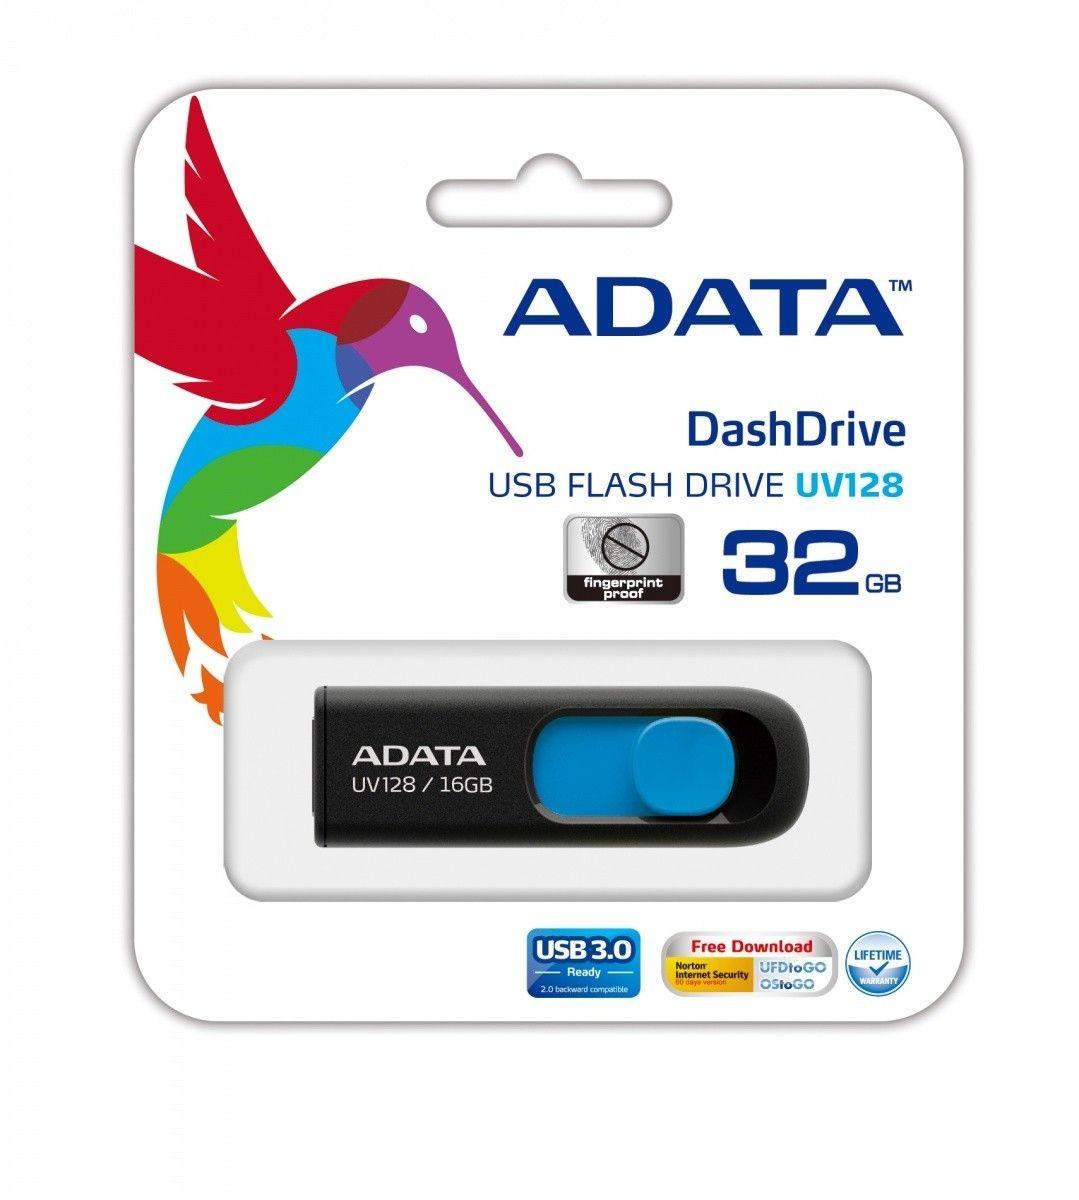 A-Data Adata pamięć USB DashDrive UV128 32GB USB 3.0 Czarny+Niebieski